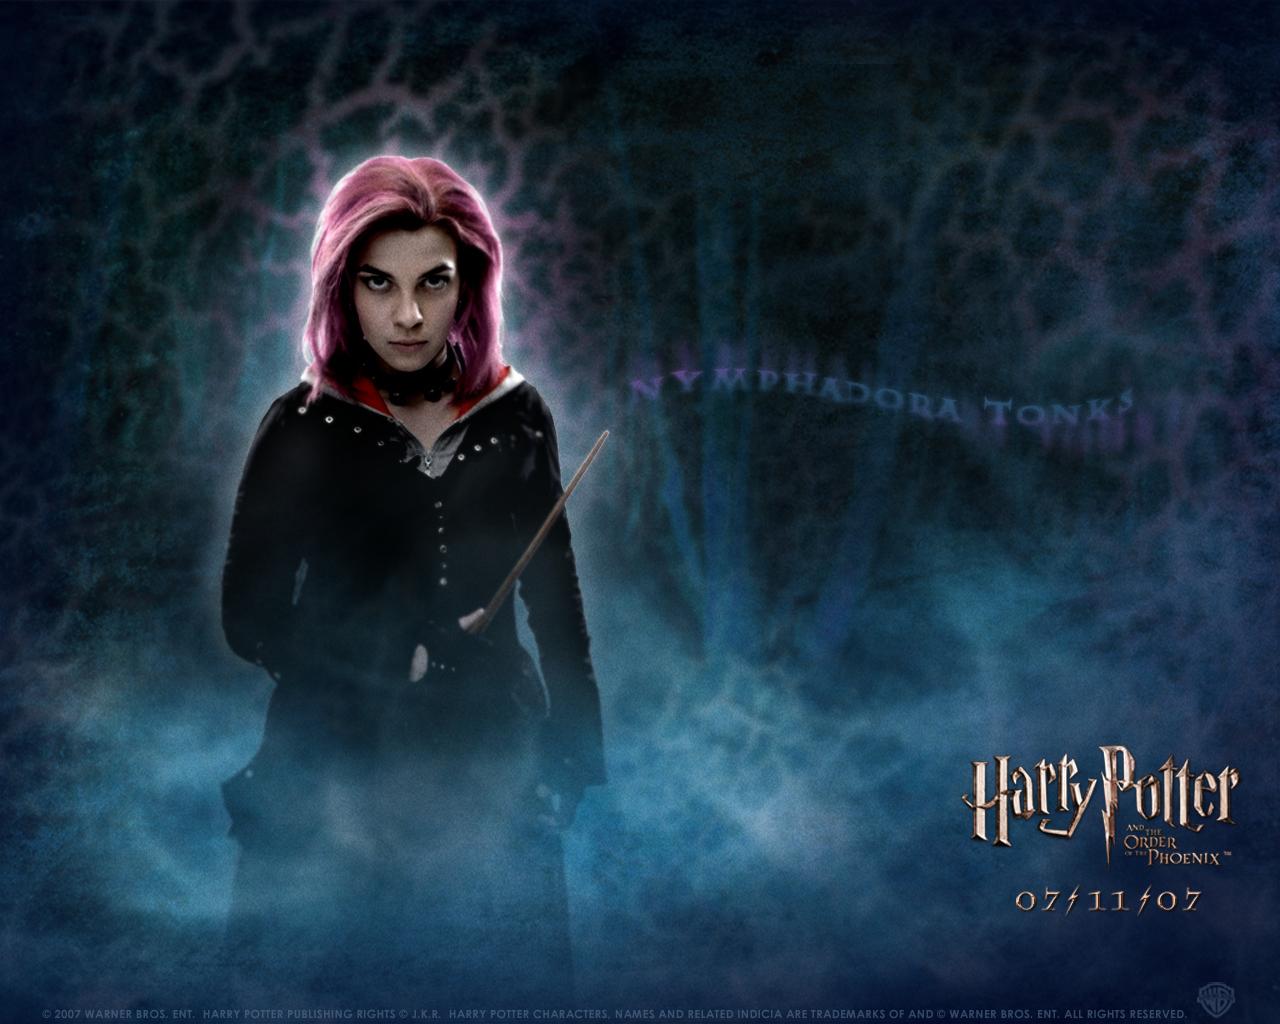 Amazing Wallpaper Harry Potter Childhood - latest?cb\u003d20111218152204  Trends_234865.jpg/revision/latest?cb\u003d20111218152204